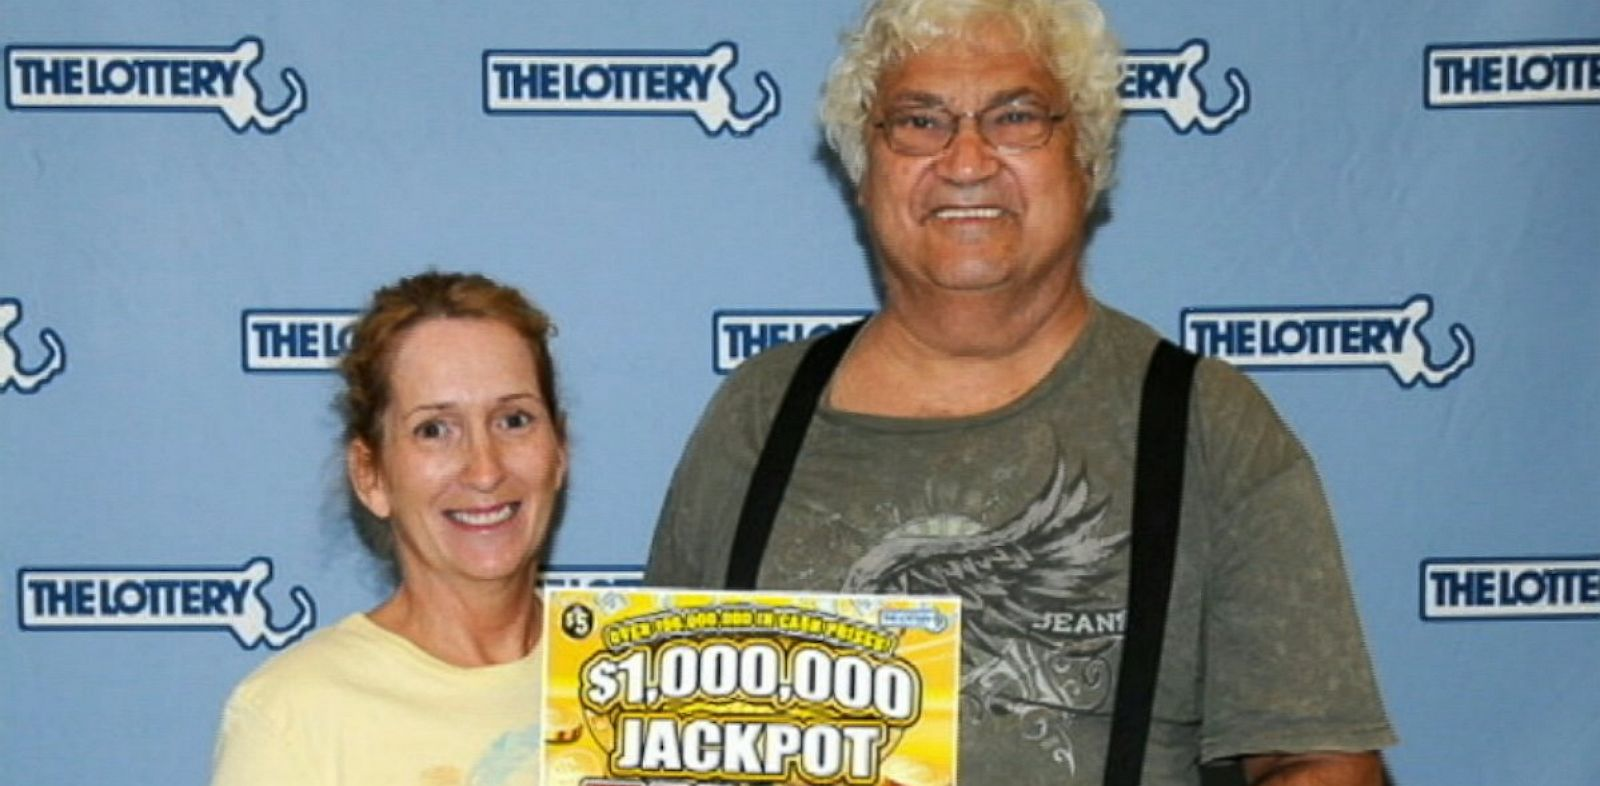 PHOTO: Joseph and Joanna Zagami won $1 million off a scratch off lottery ticket